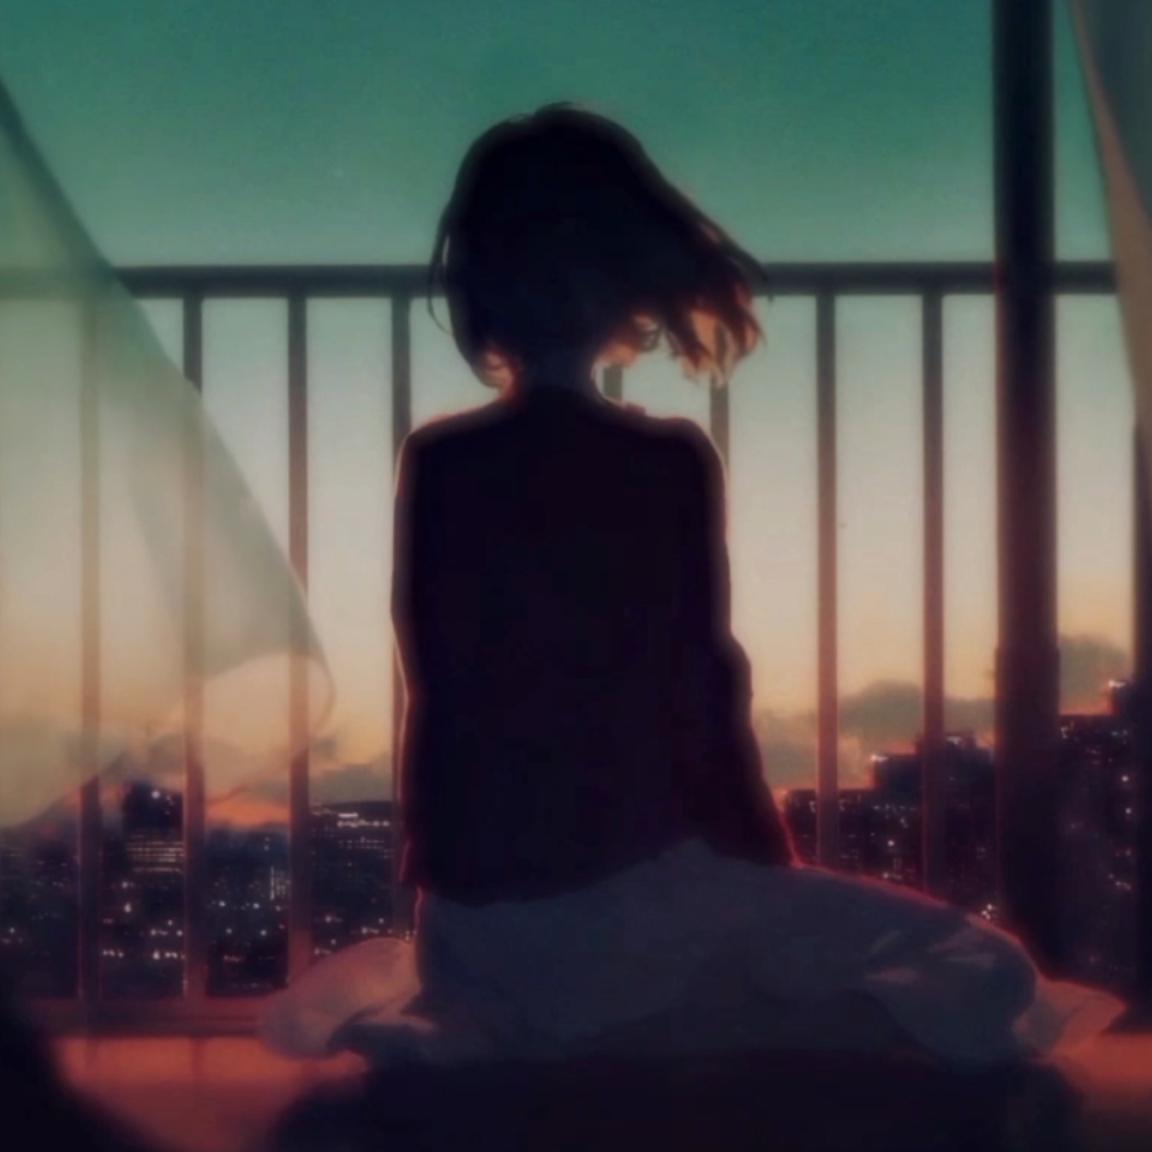 Sunset Girl Animation